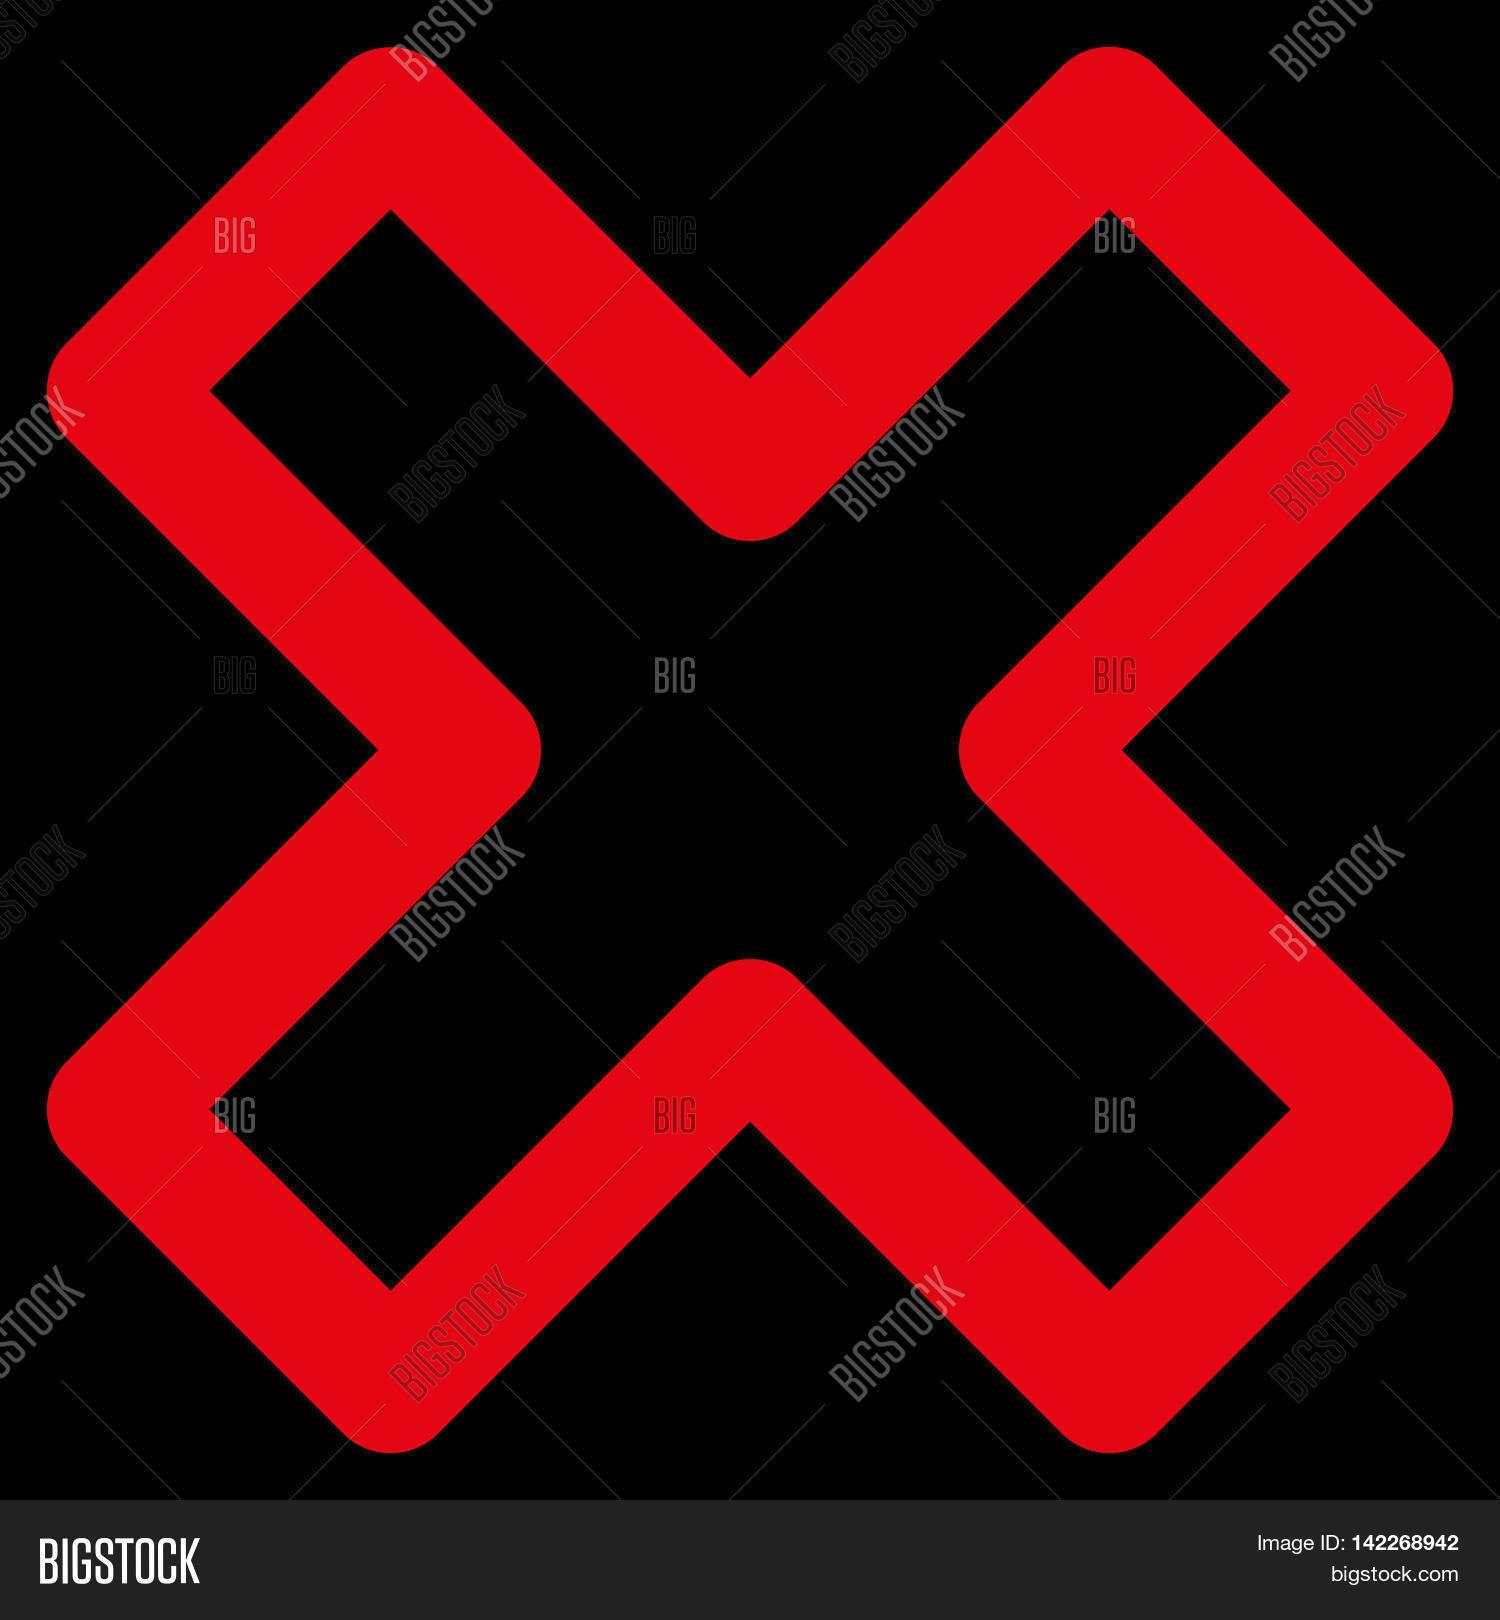 Delete X Cross Glyph Image Photo Free Trial Bigstock